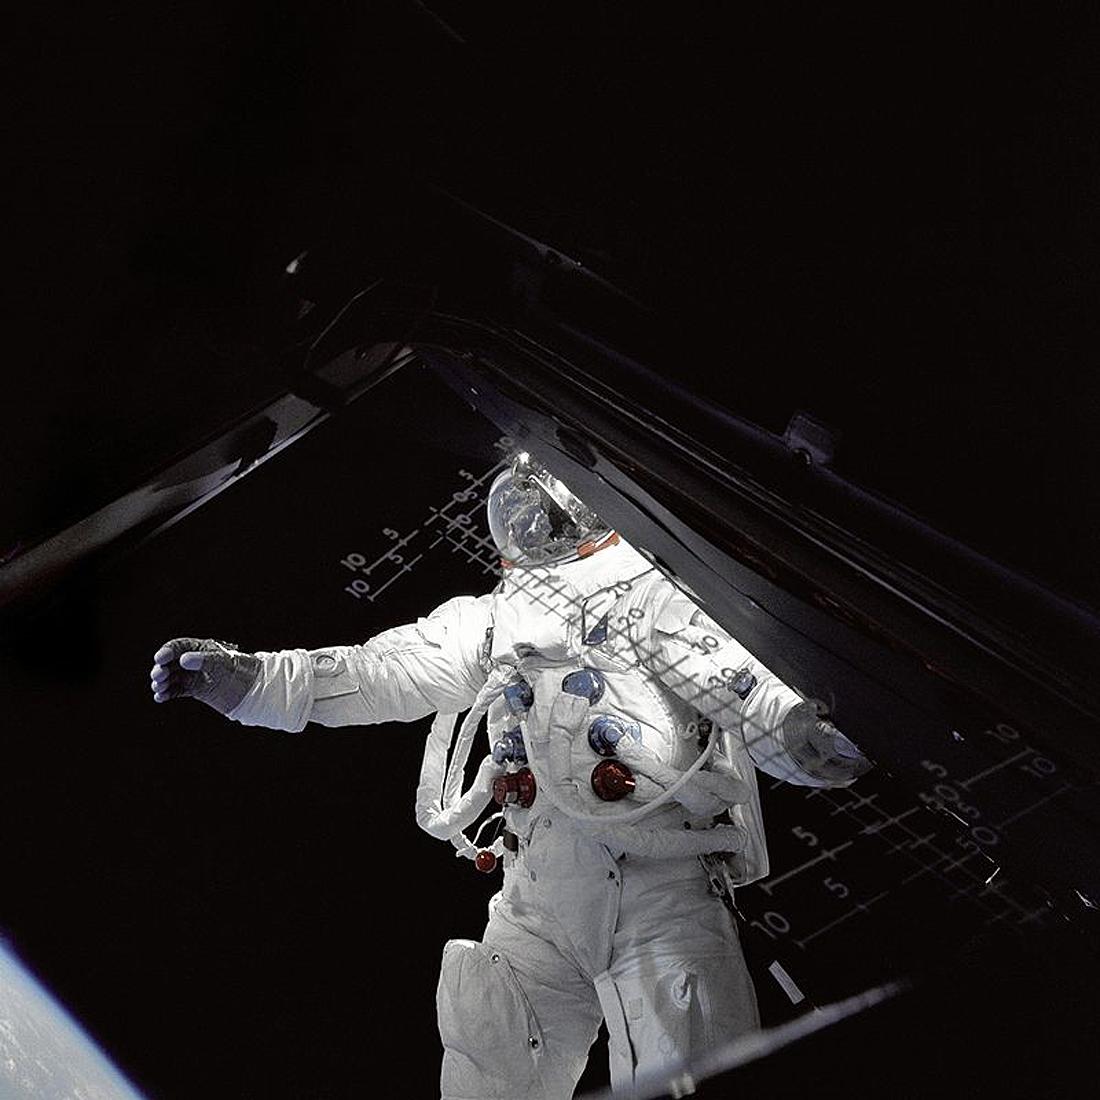 Apollo 9 Schweickart